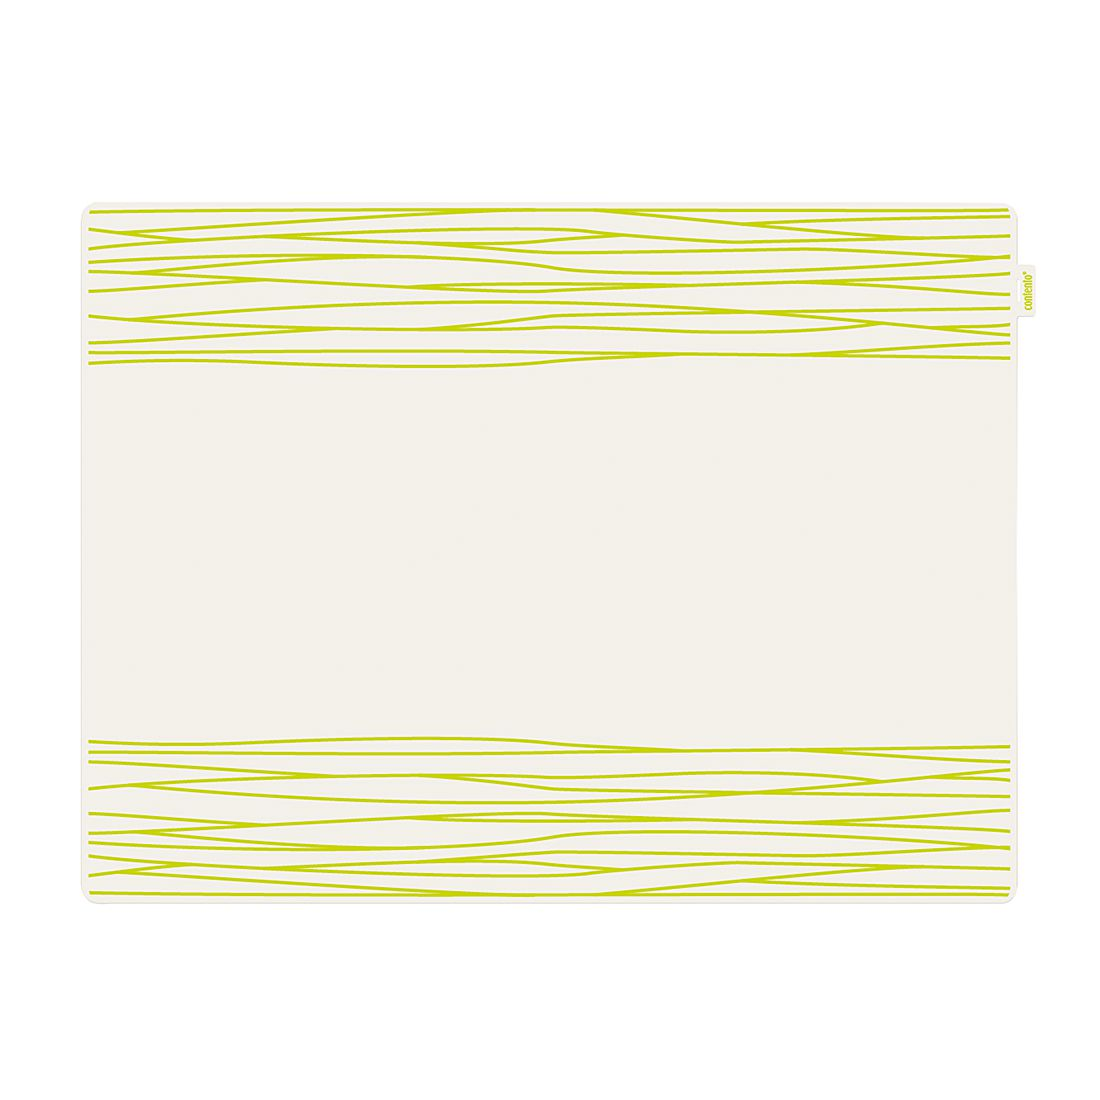 Tischset Jay (4er-Set) – Silikon Grün, Contento günstig kaufen